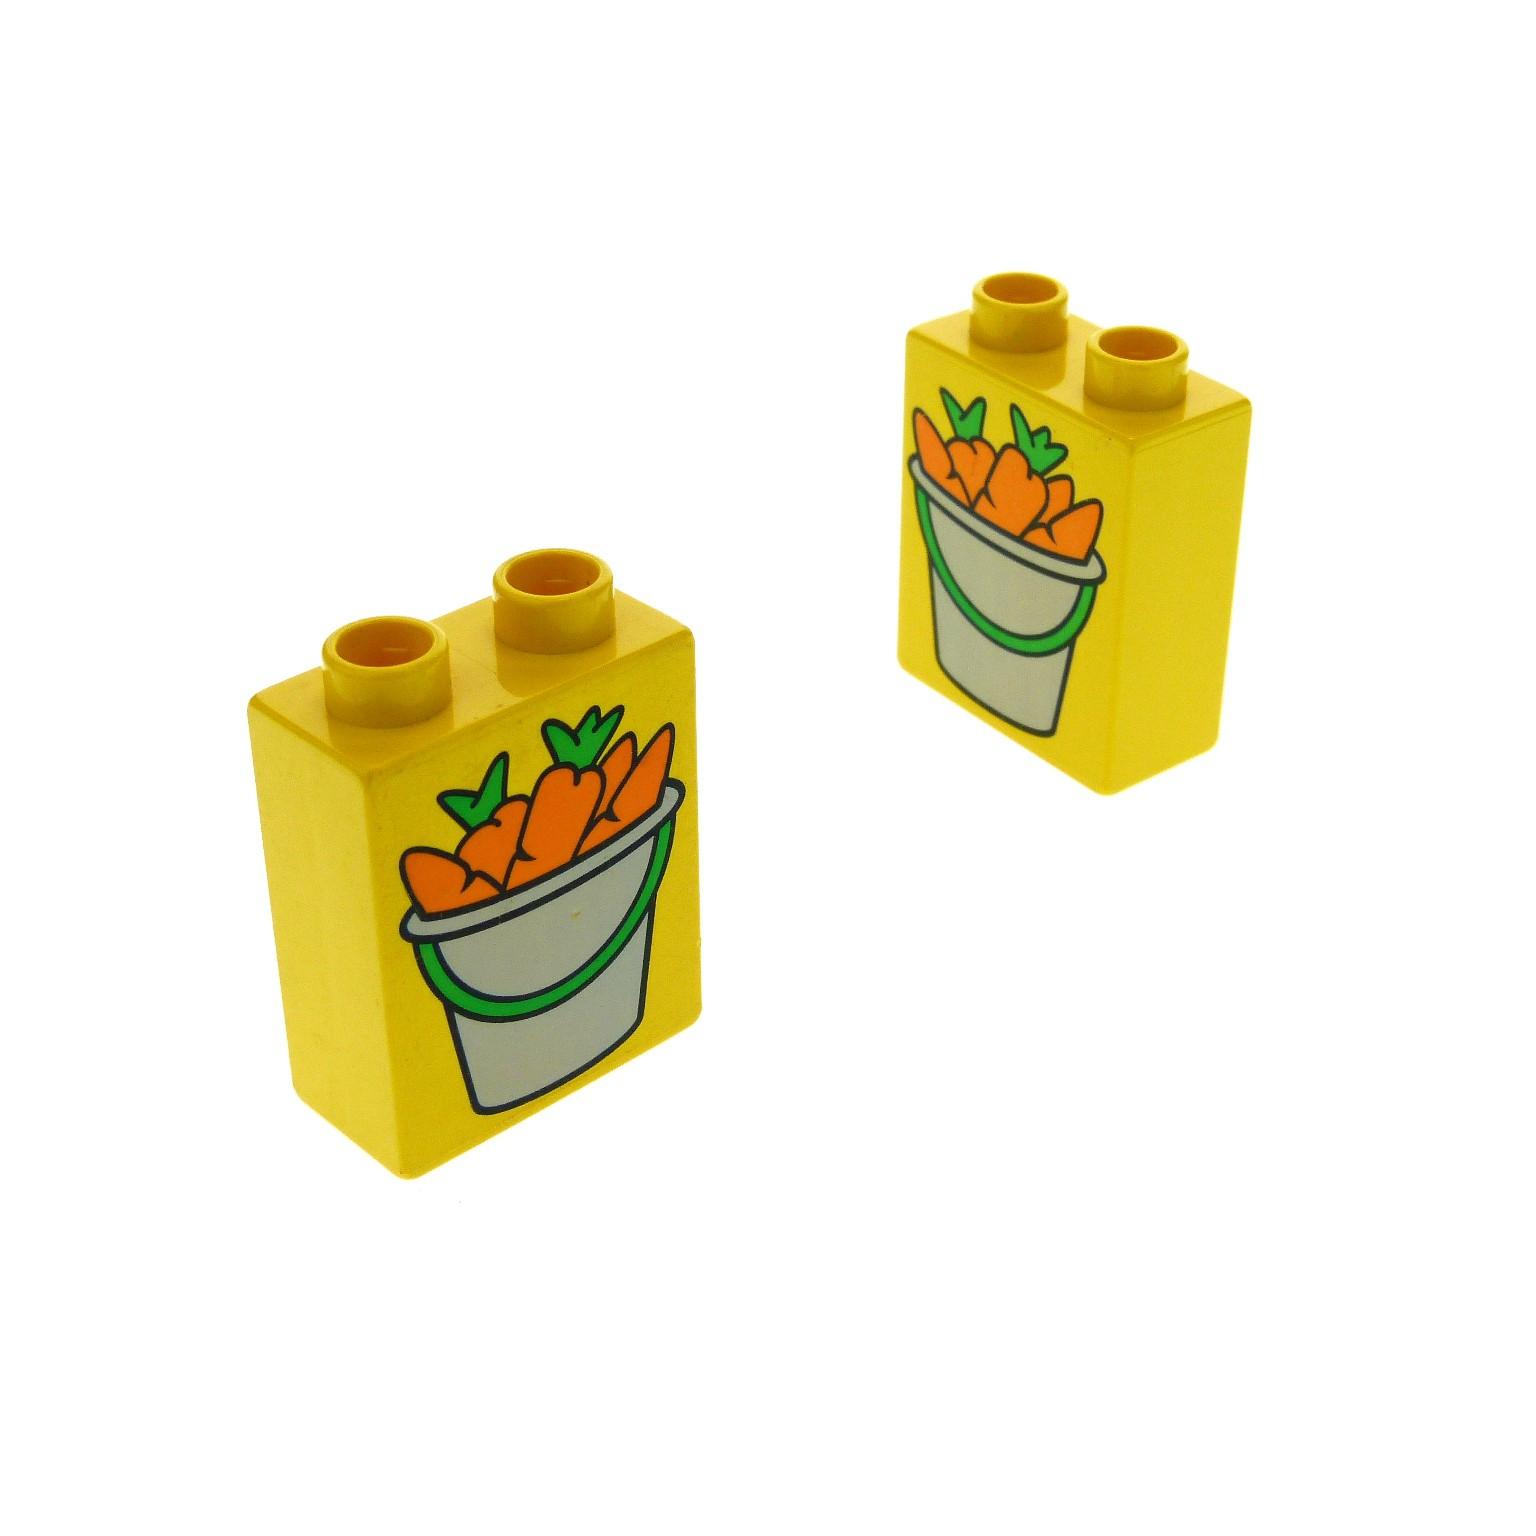 2 X Lego Brick Yellow Duplo Brick 1 X 2 X 2 With Bucket Of Carrots